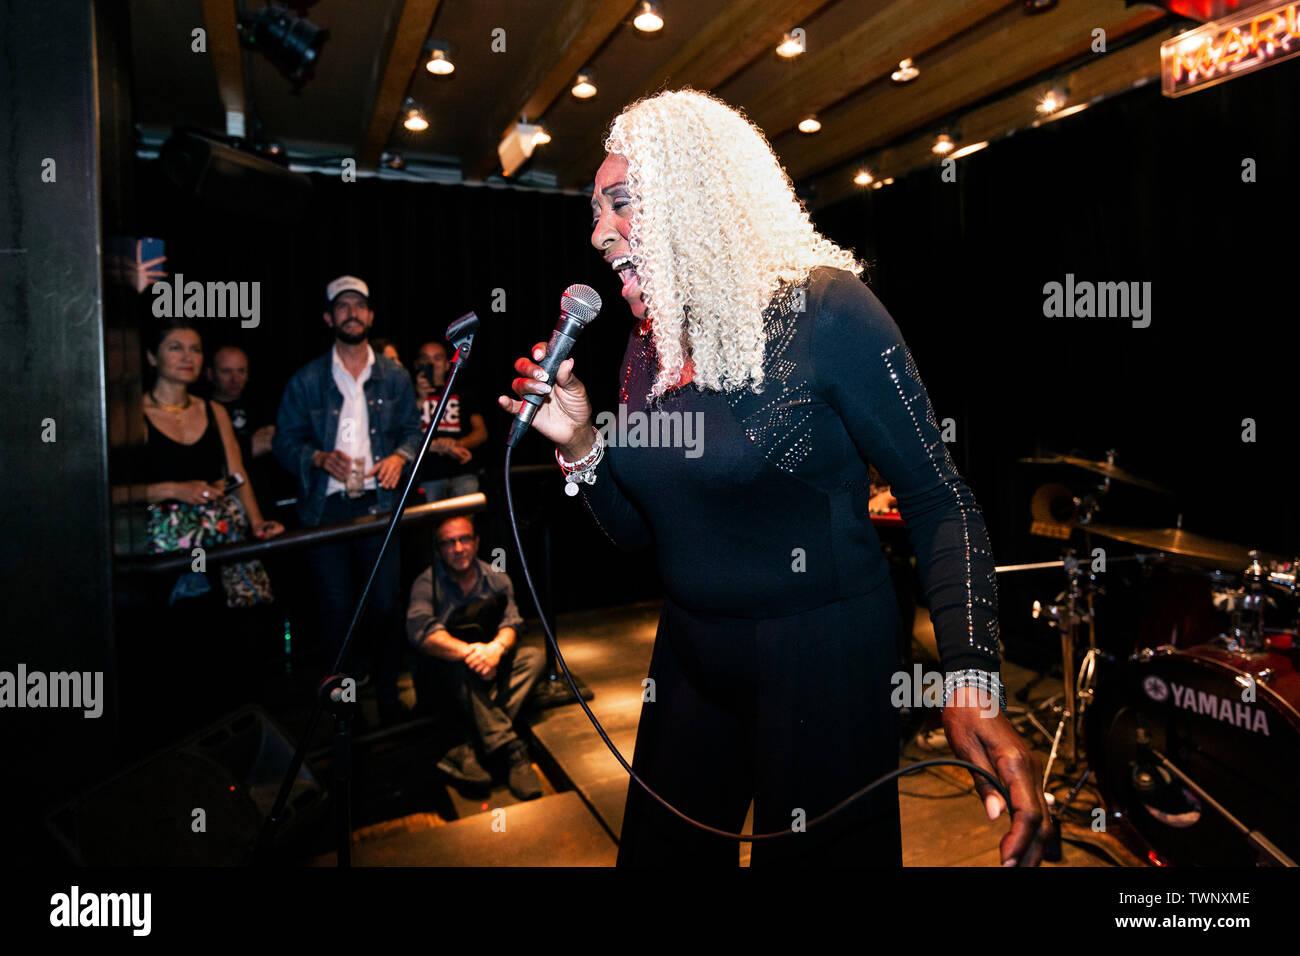 Barcelona, Spain. 15.06.2019. Concert by Martha High in Marula Café. Photographer: Aitor Rodero. - Stock Image